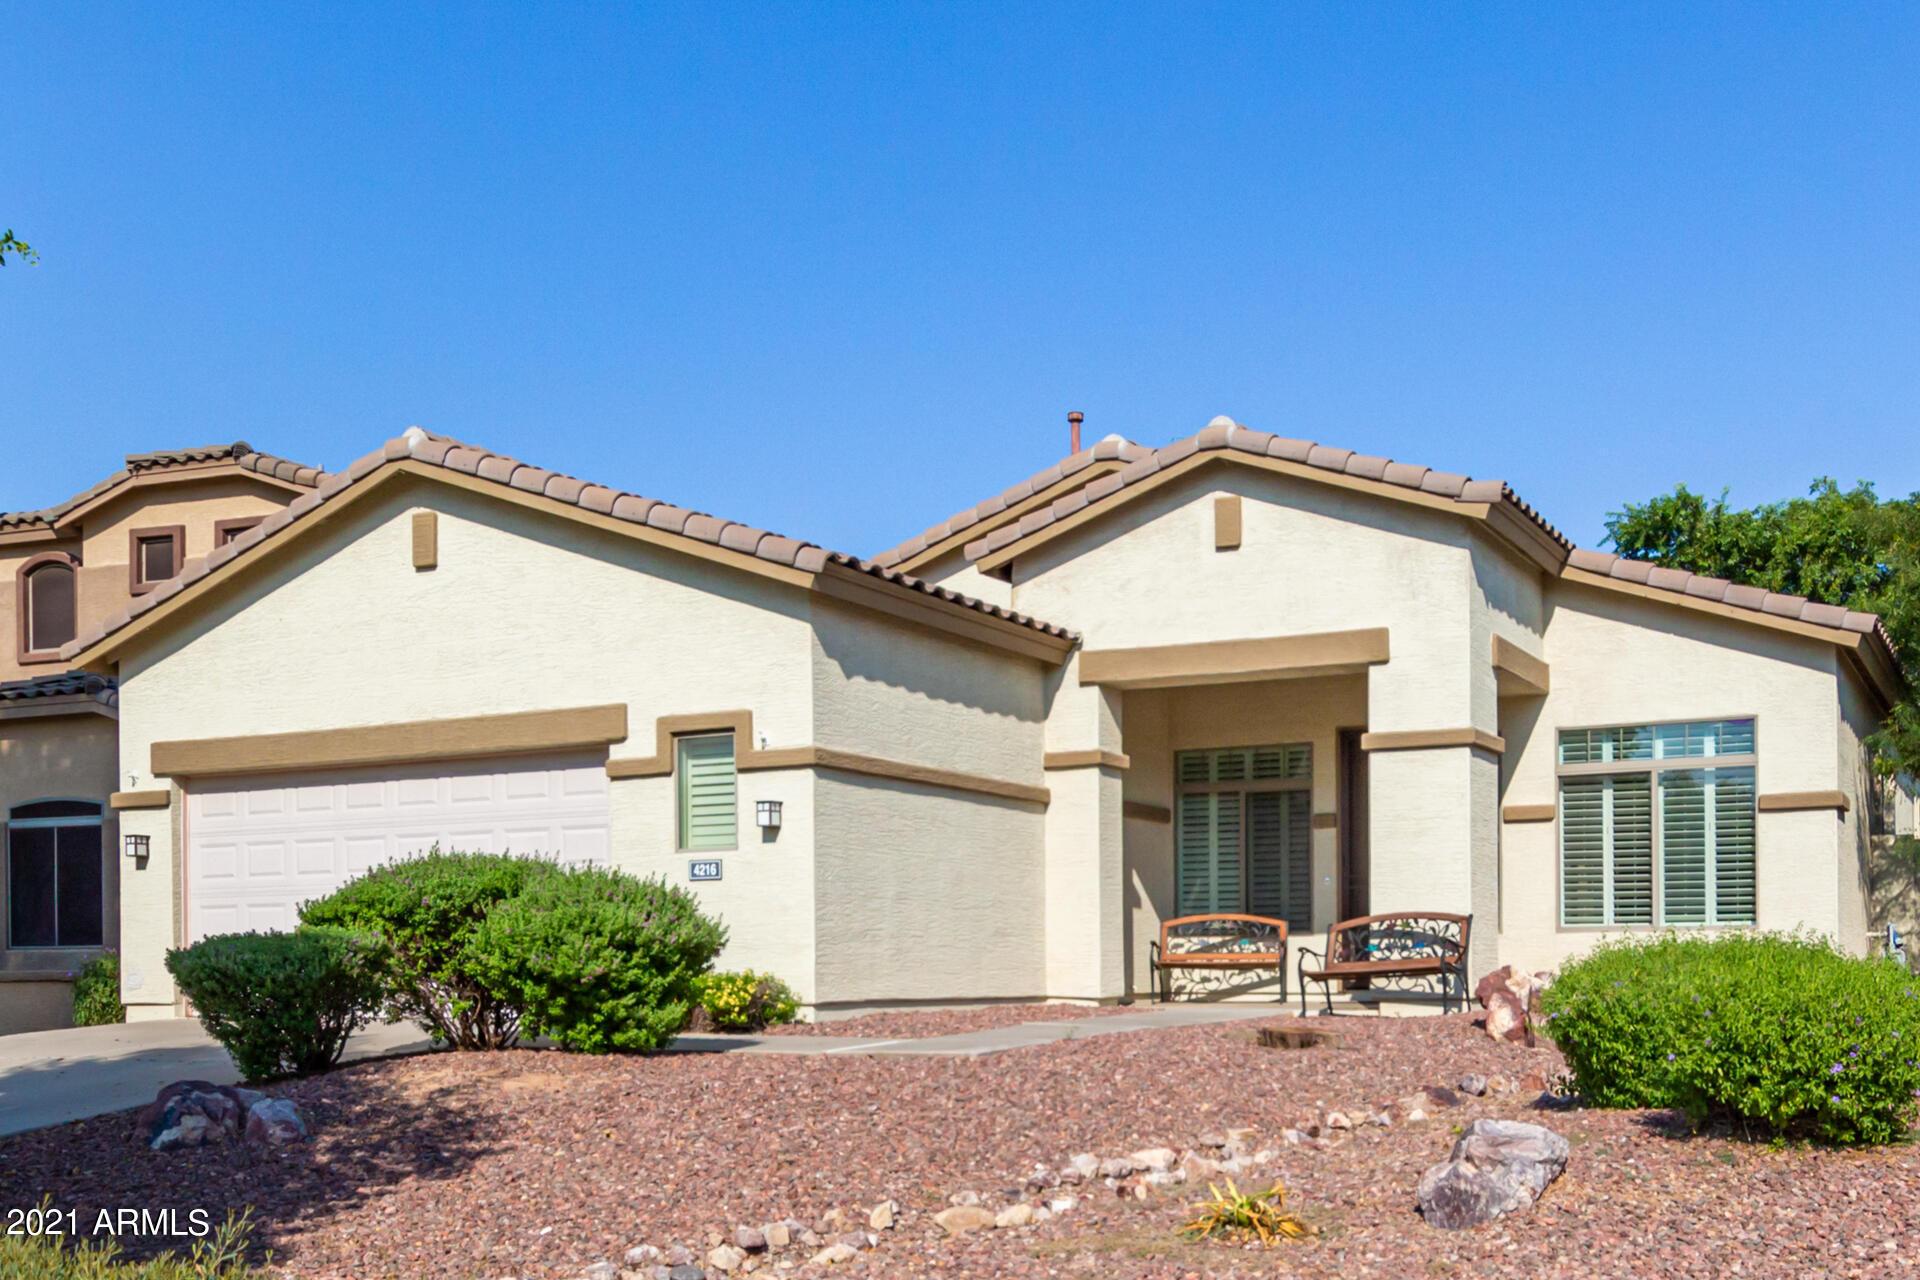 4216 POMMEL Loop, Gilbert, Arizona 85297, 3 Bedrooms Bedrooms, ,2 BathroomsBathrooms,Residential,For Sale,POMMEL,6294089